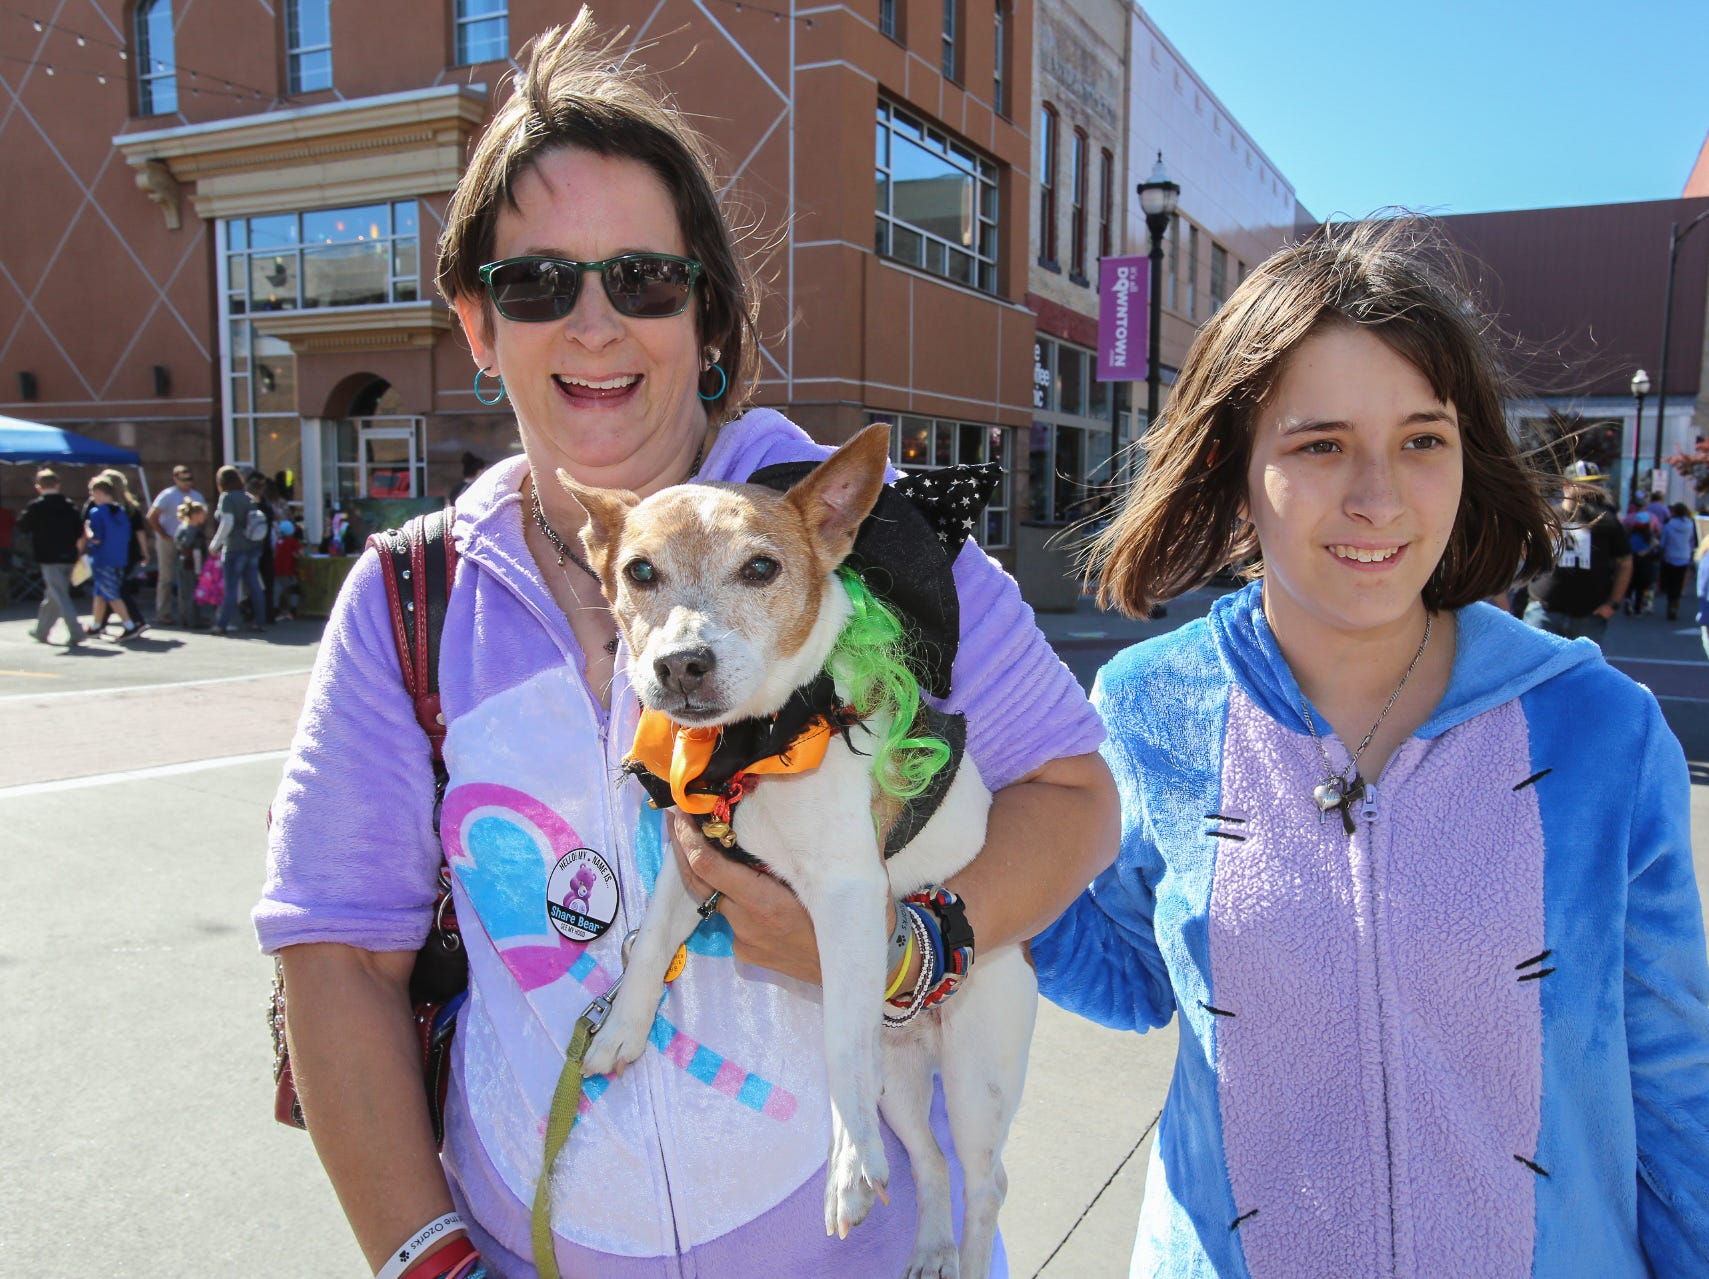 Pup Pup, Amy Mattlage, and Shayla Doss